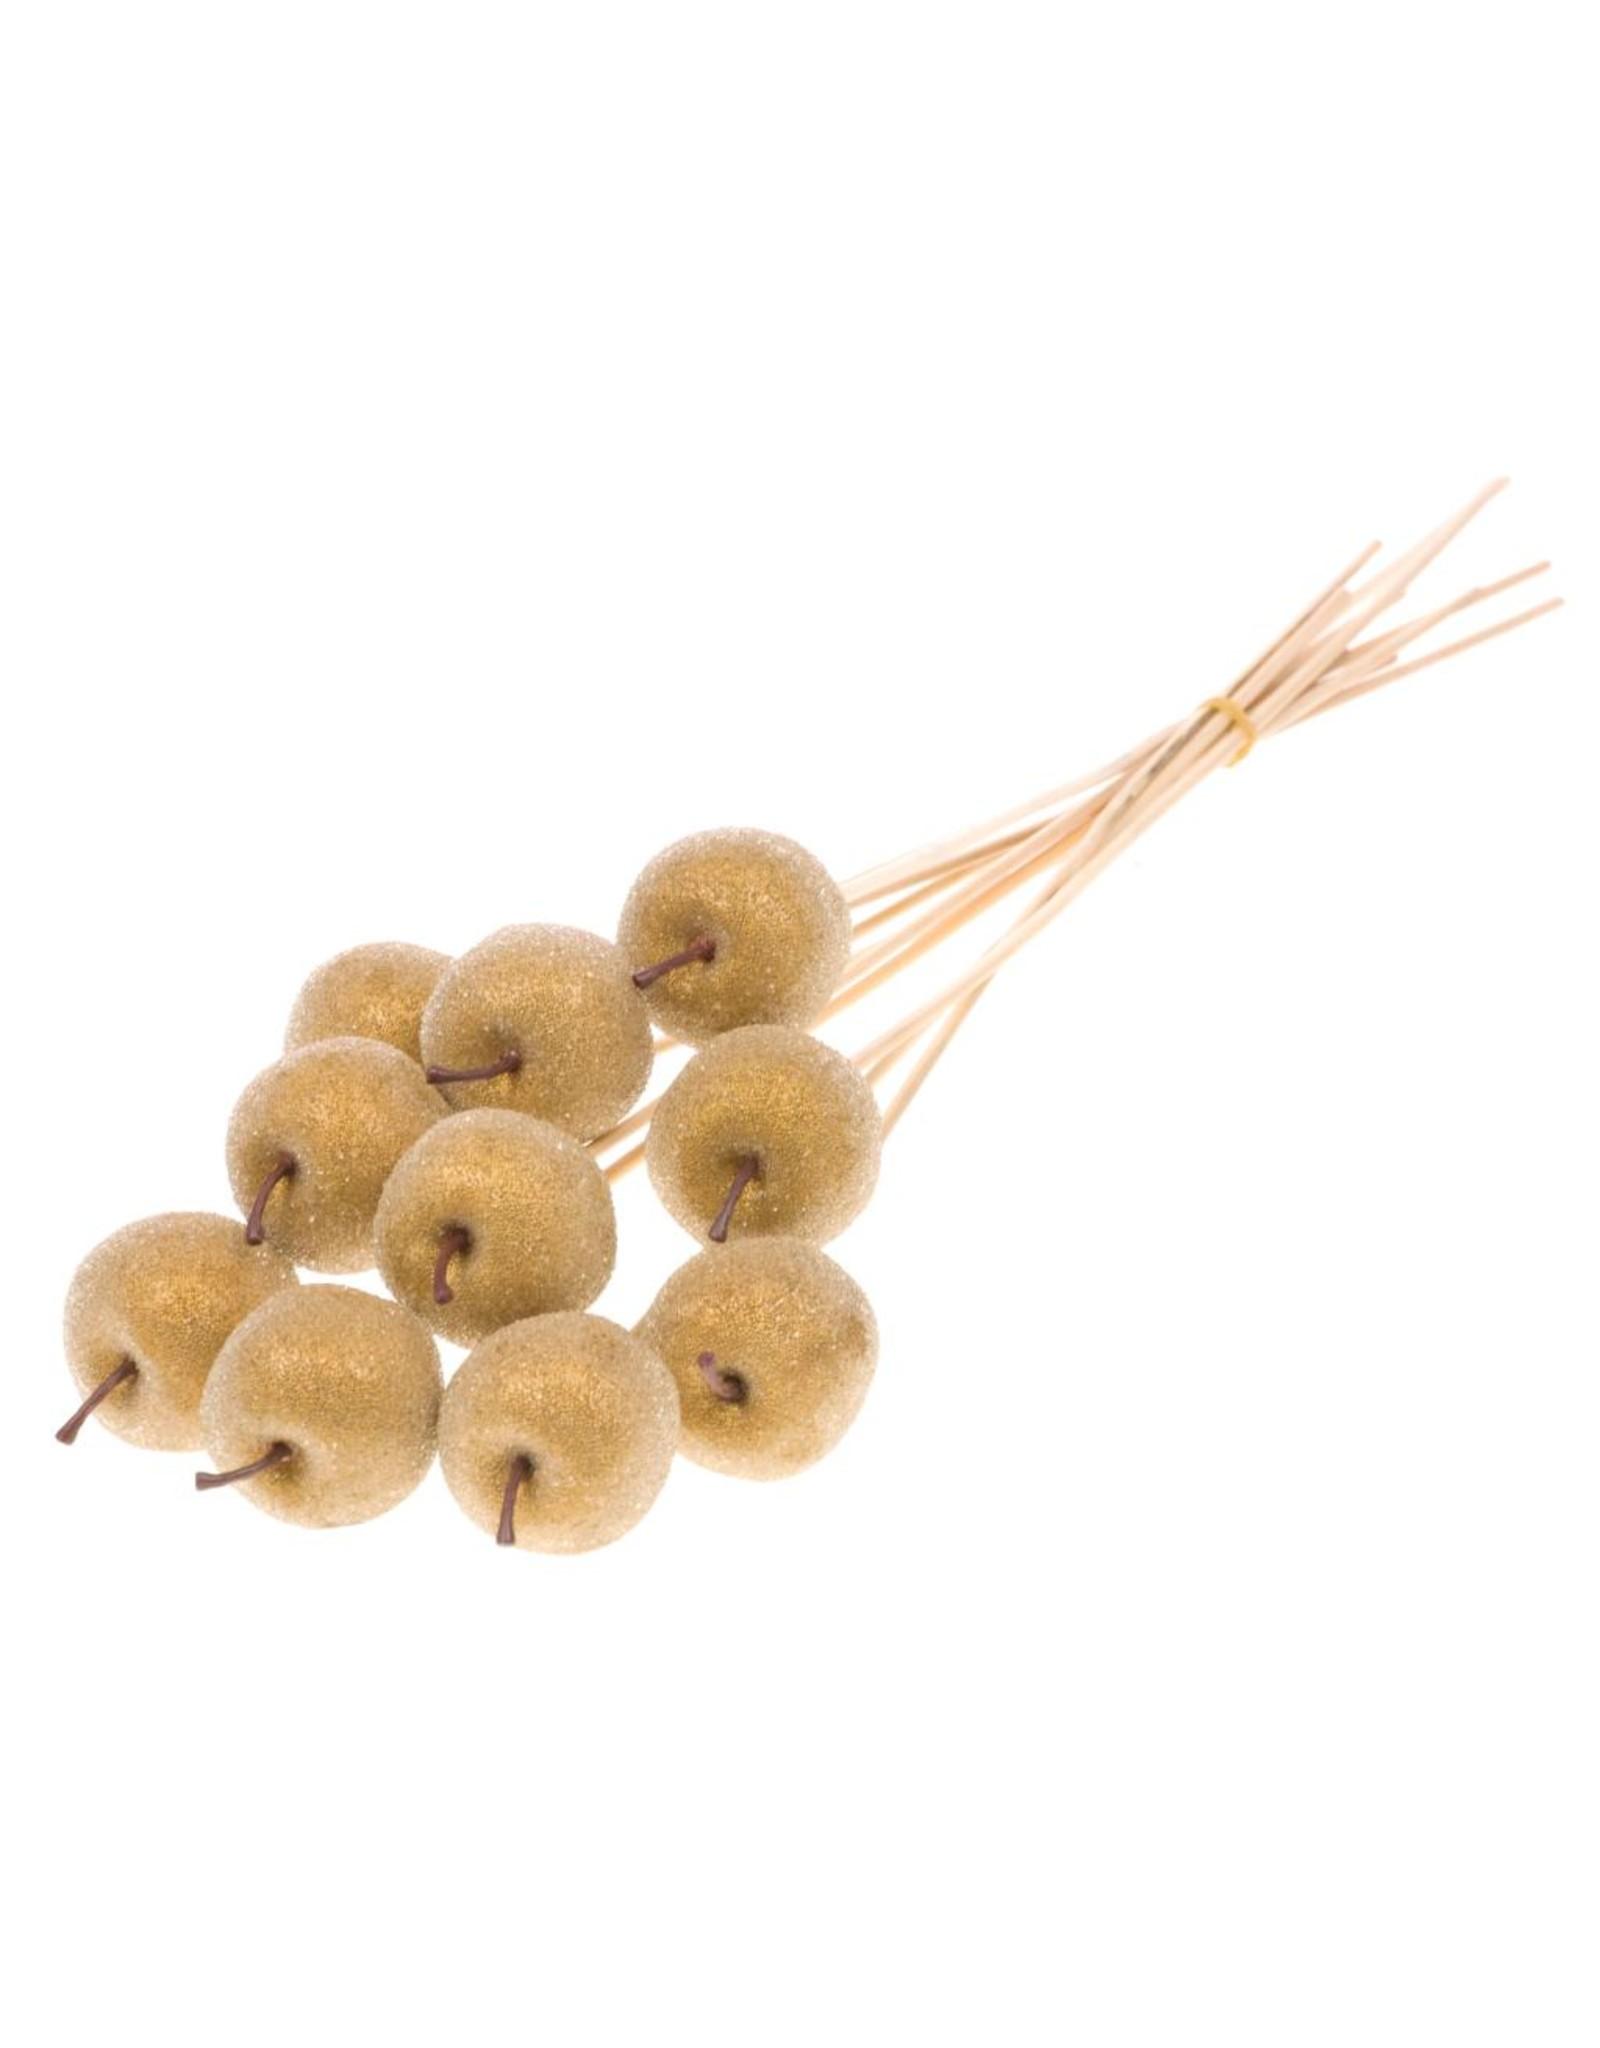 Apple sugar 5cm o/s 10pc gold x 20